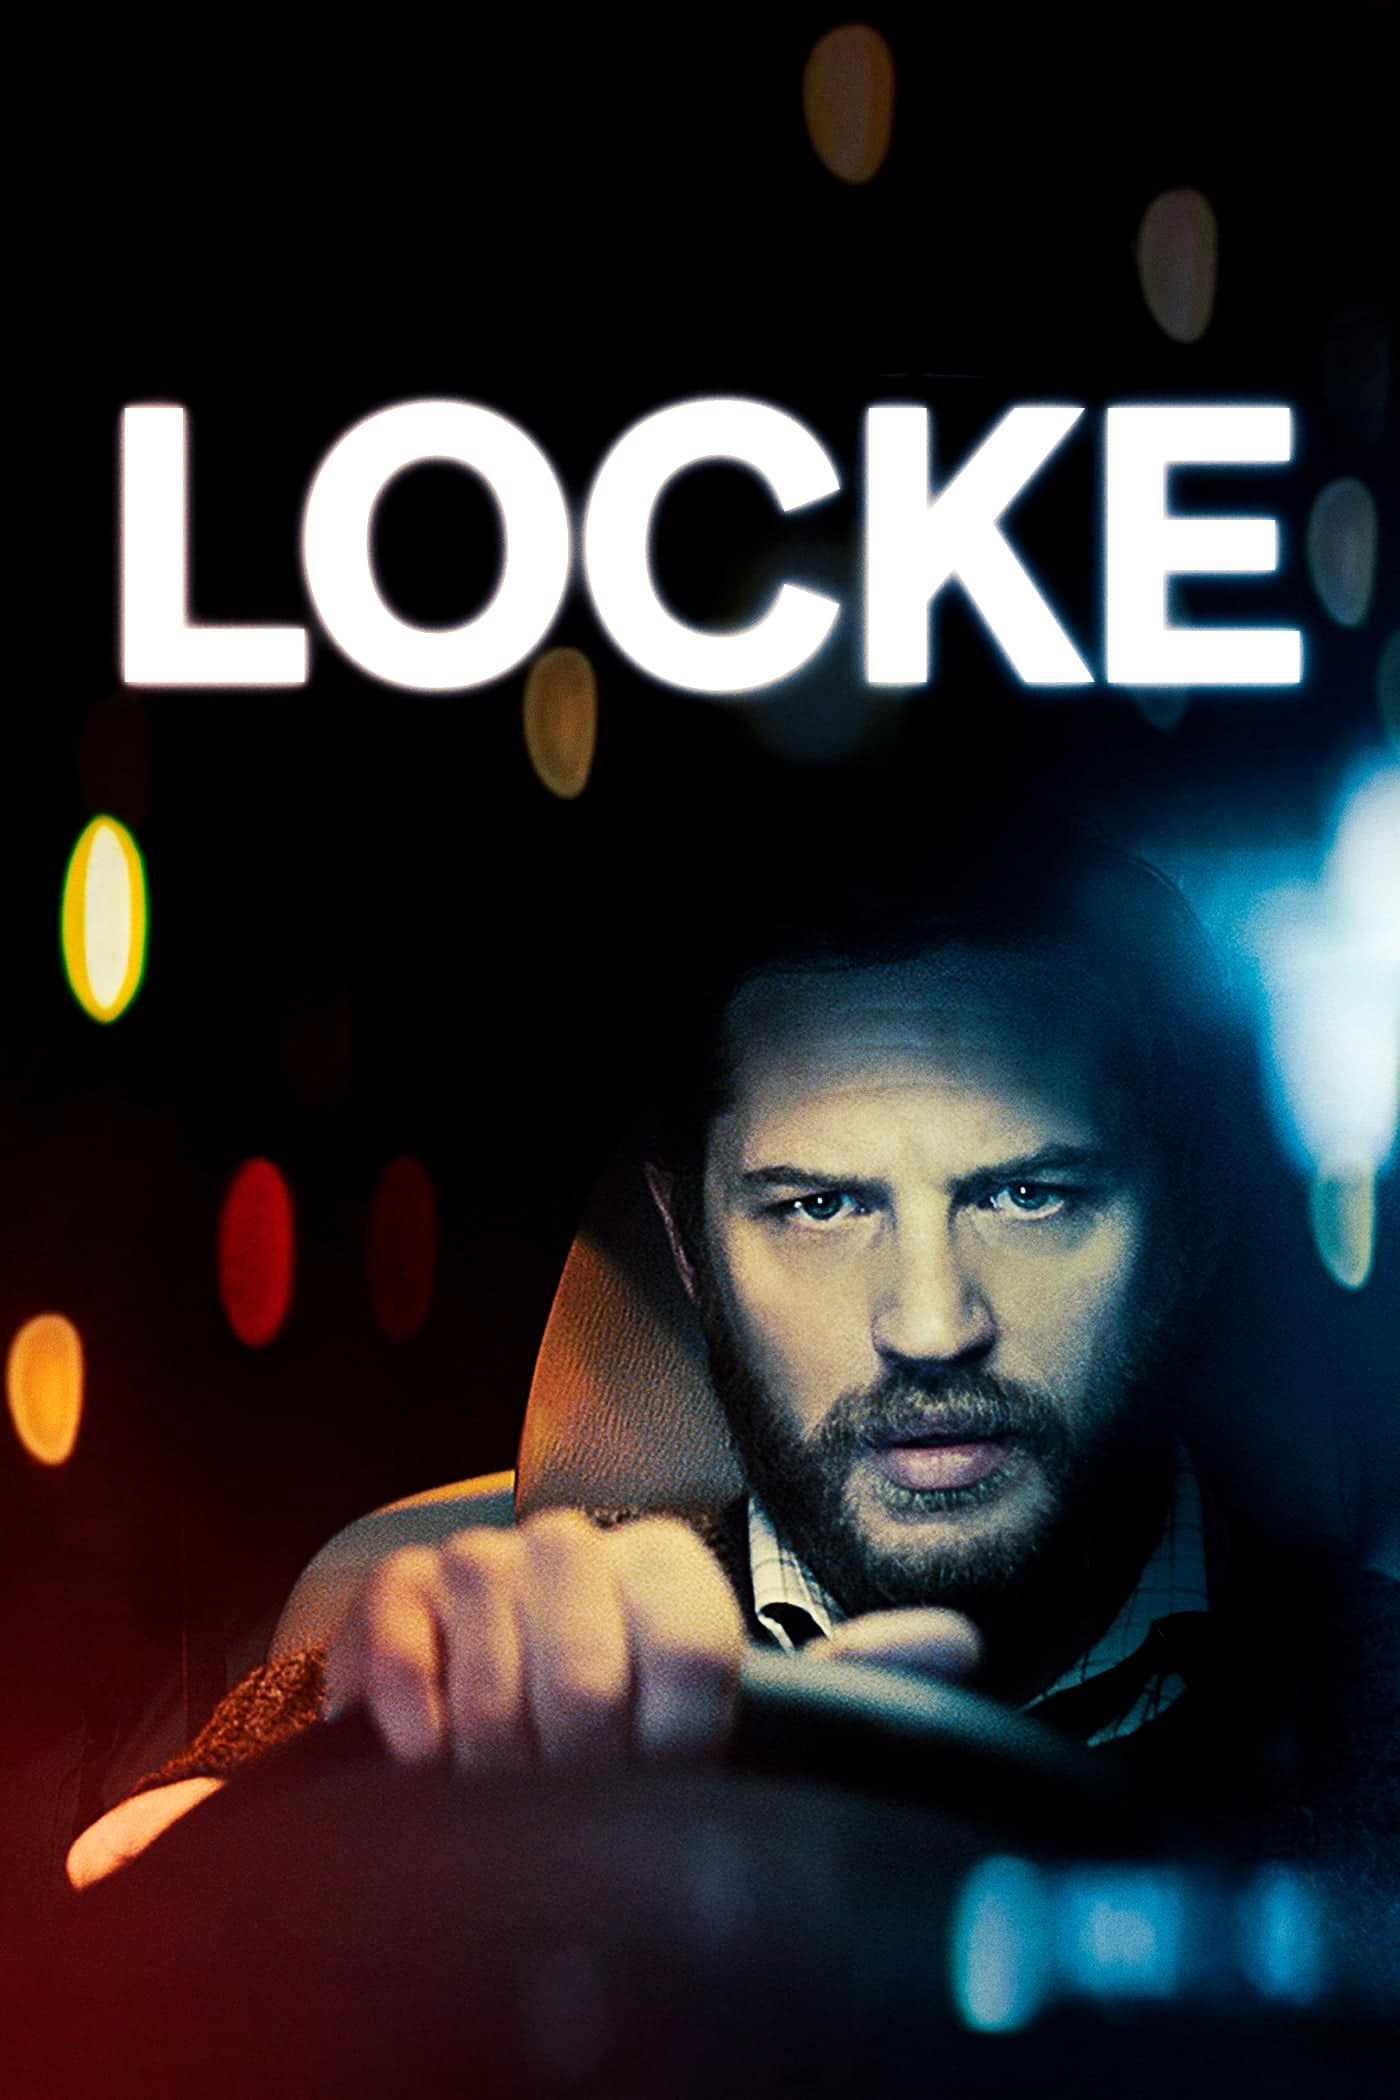 Locke, 2013